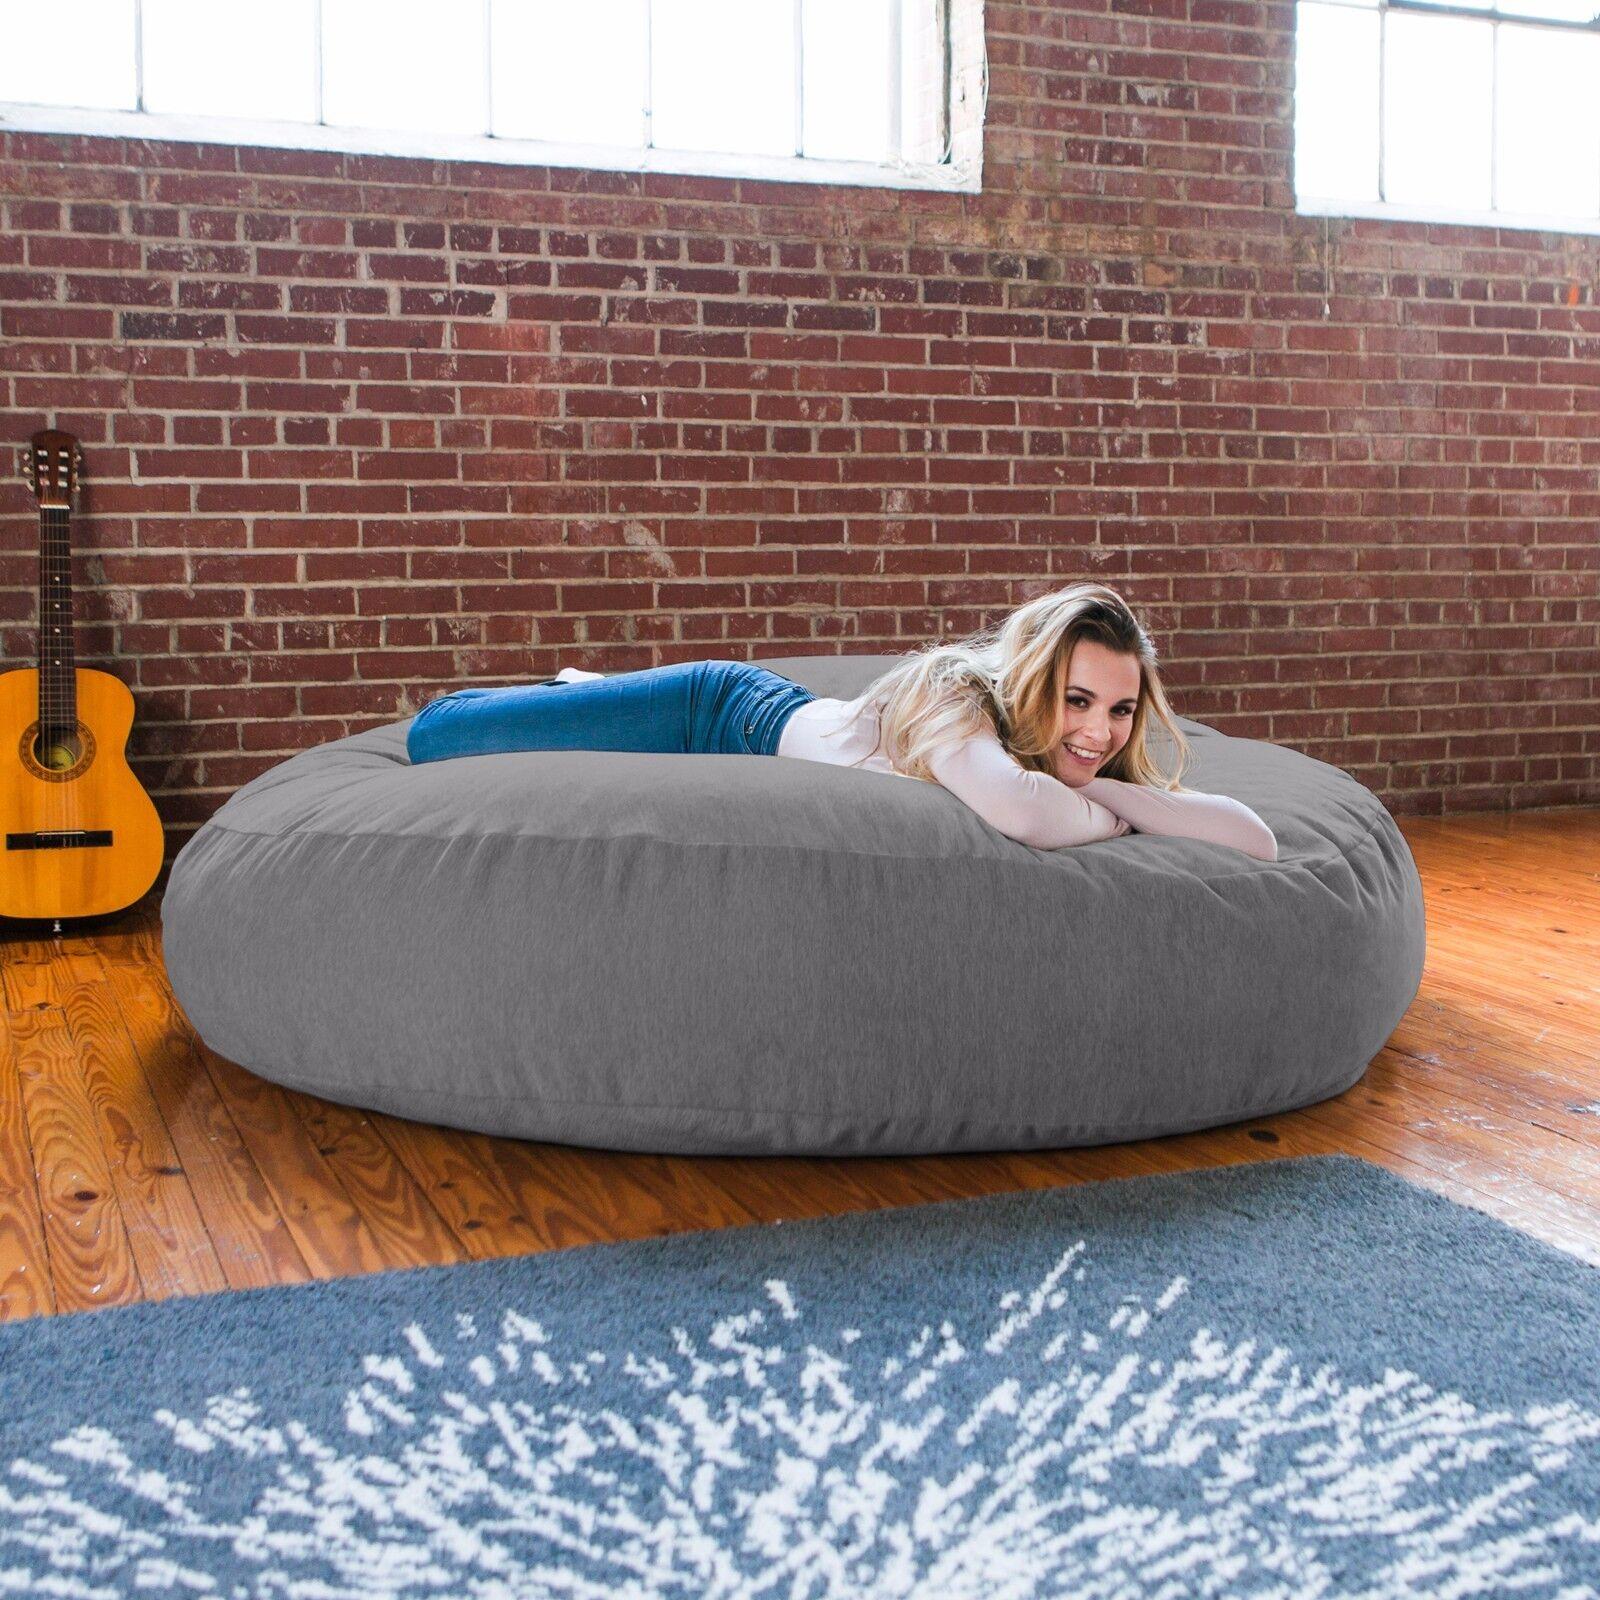 Jaxx 6 Foot Cocoon - Giant Bean Bag Lounge for Adults - Premium Chenille Startseite